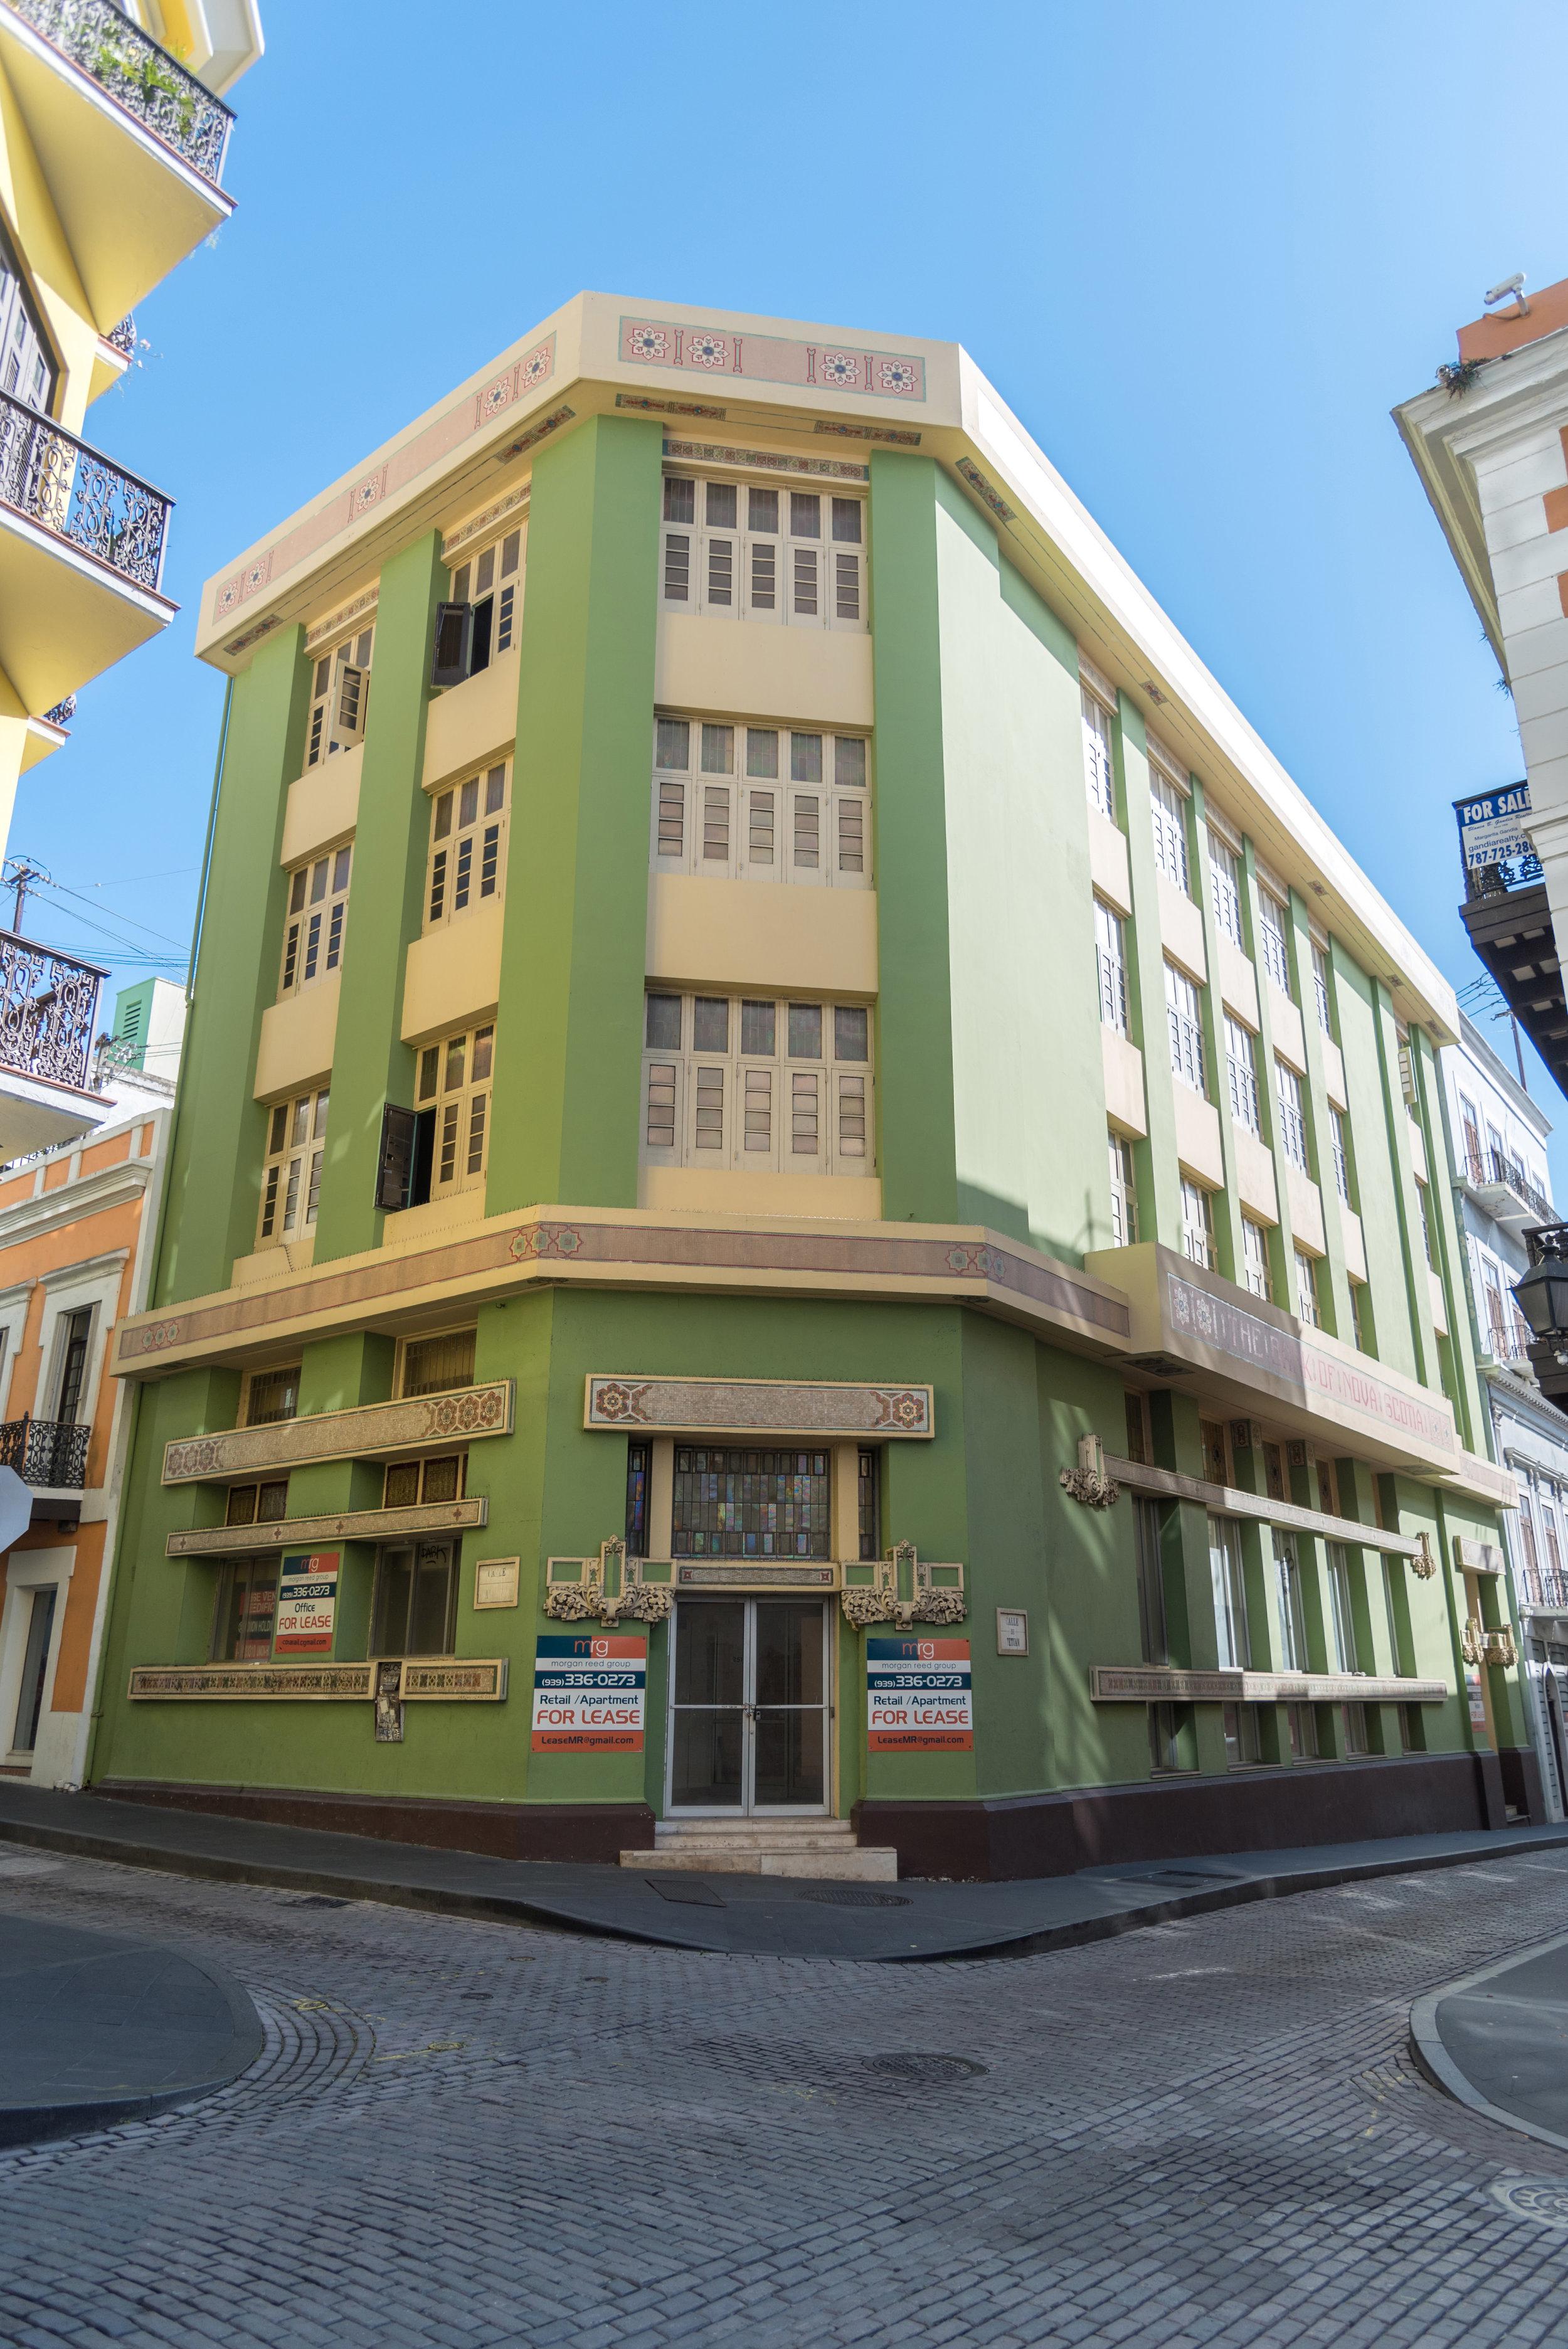 SCOTIABANK BUILDING    RETAIL/RESIDENTIAL CONVERSION - Old San Juan, Puerto Rico    Historic Scotiabank building located in Old San Juan